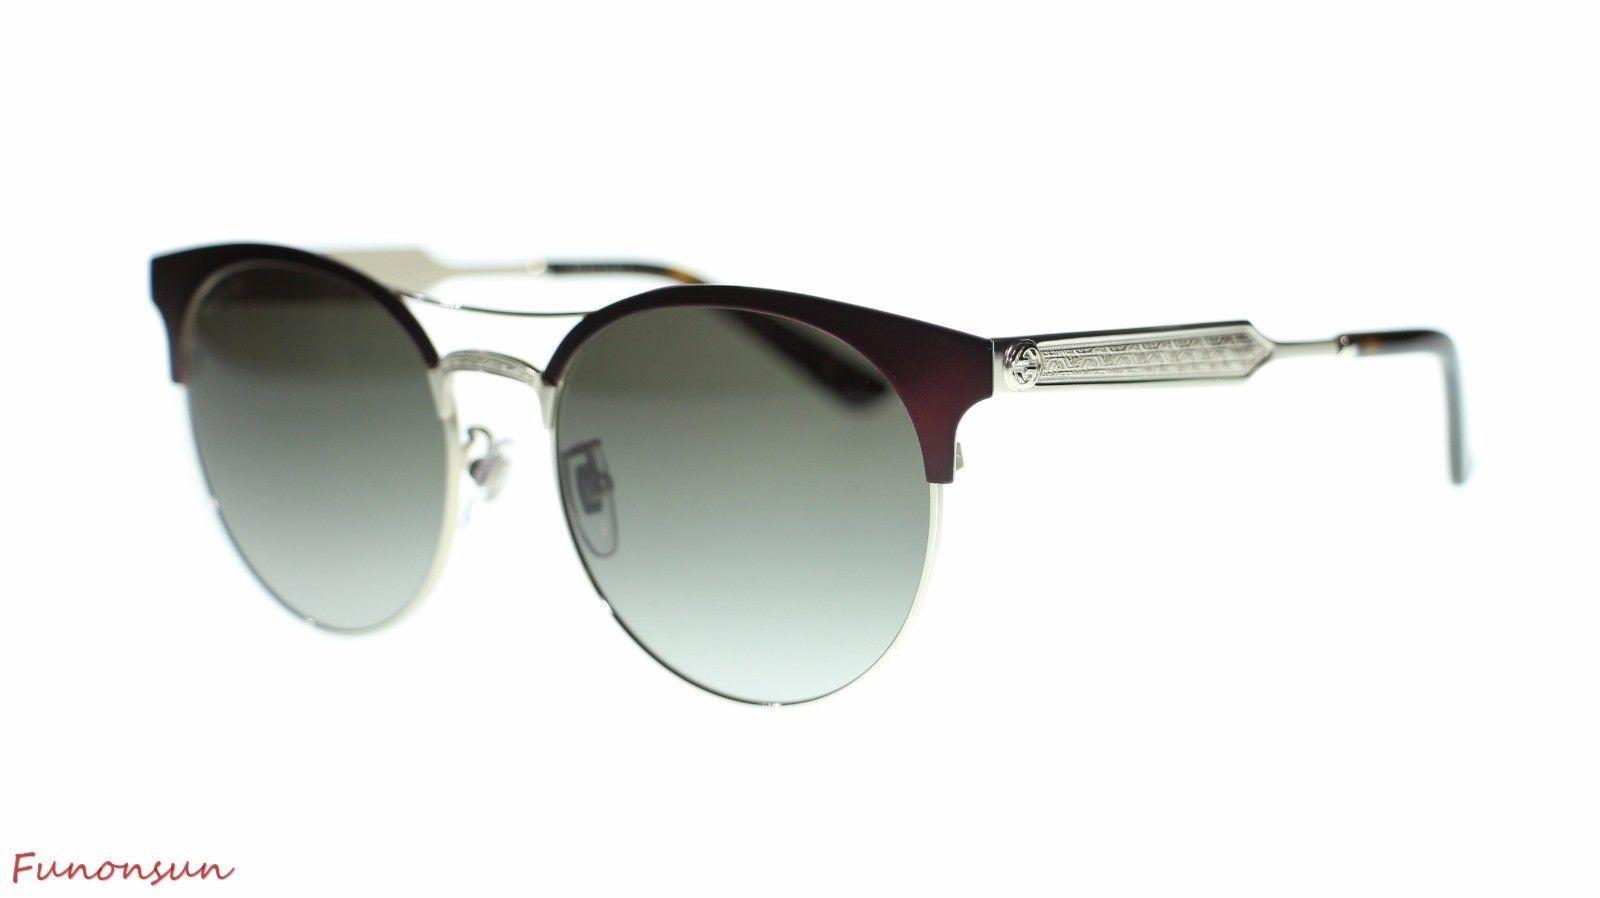 20f498ec63 S l1600. S l1600. Previous. Gucci Women Round Sunglasses GG0075 004  Burgundy Gold Grey Gradient Lens 56mm